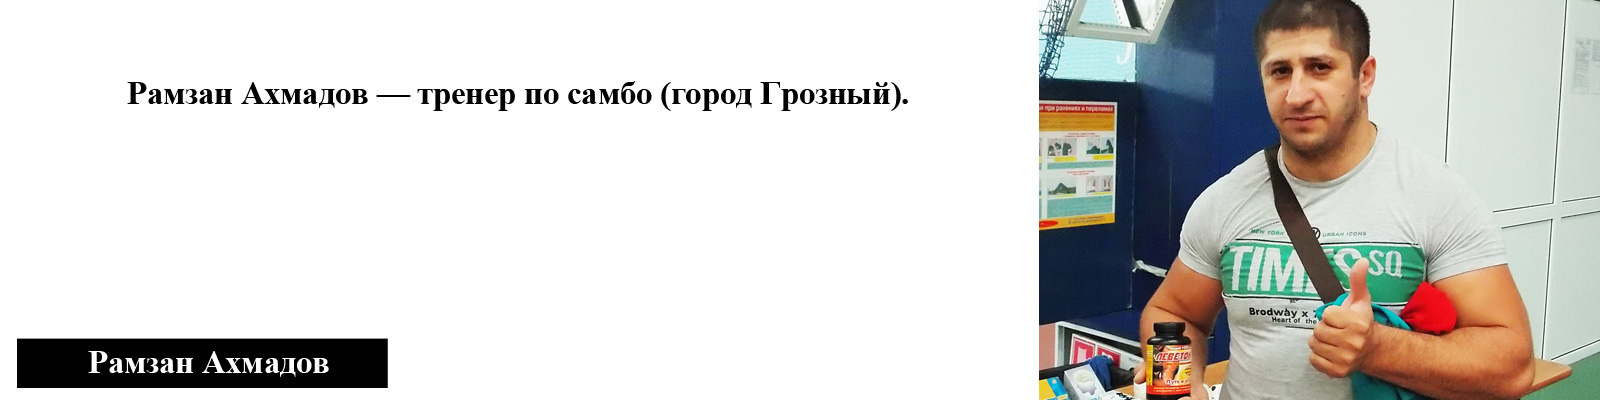 Рамзан Ахмадов - тренер по самбо.